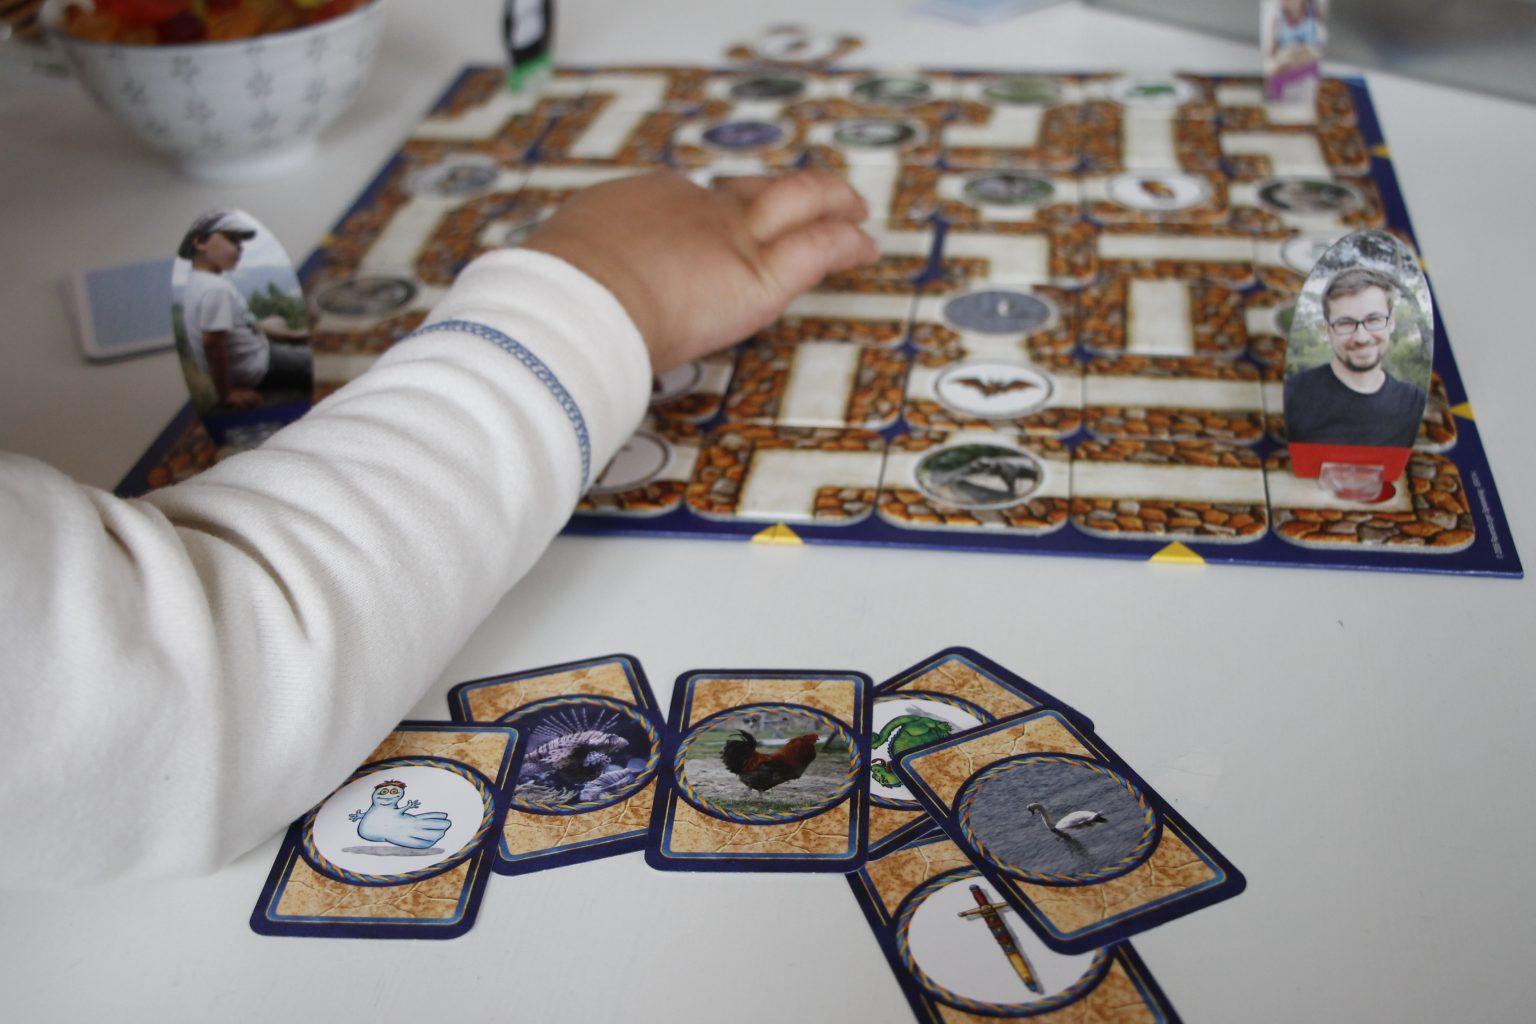 Ravensburger my verrücktes Labyrinth selbst gestalten